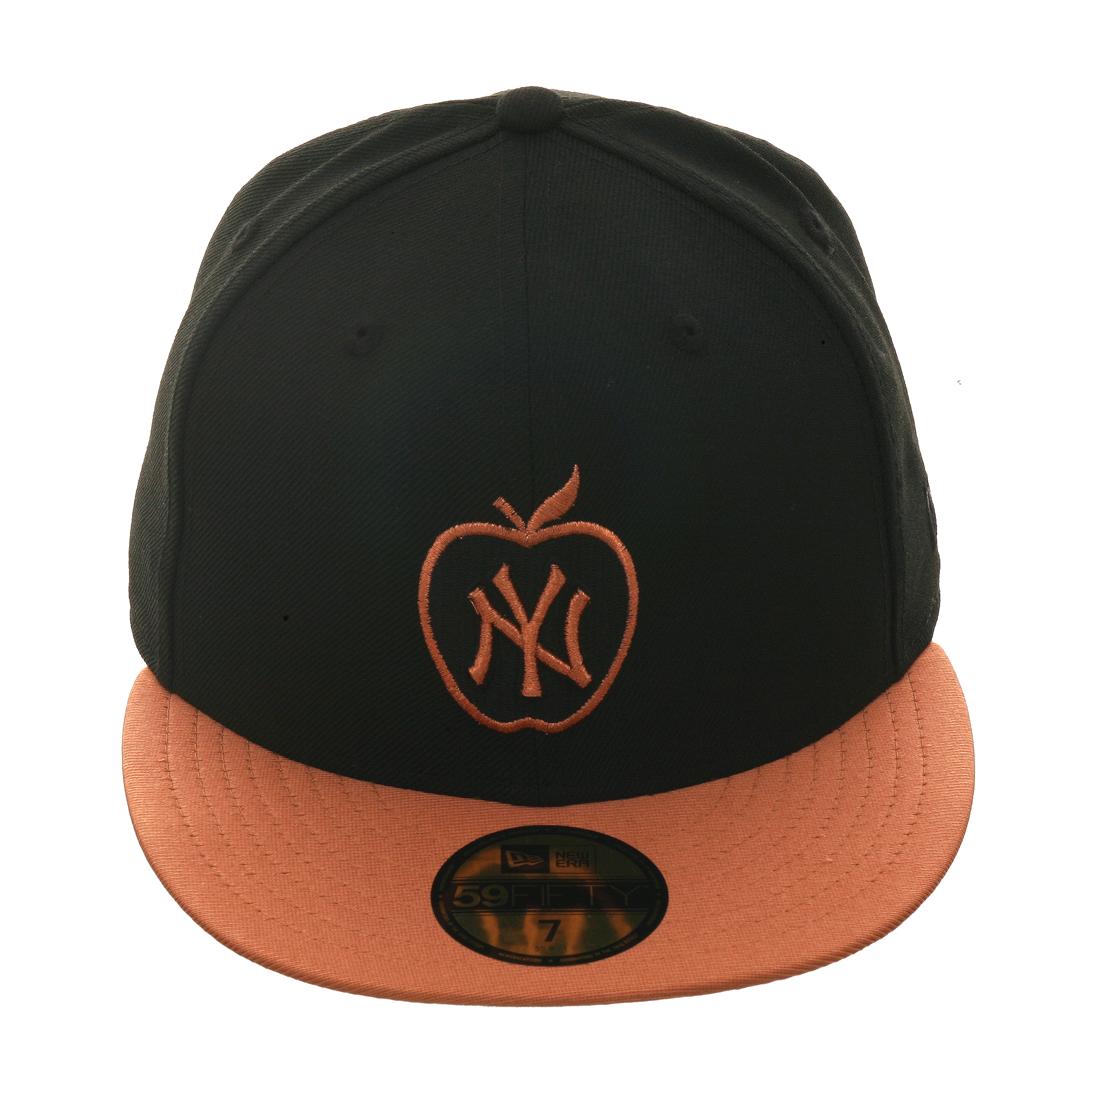 d9f384dae7d Exclusive New Era New York Yankees Apple - 2T Black